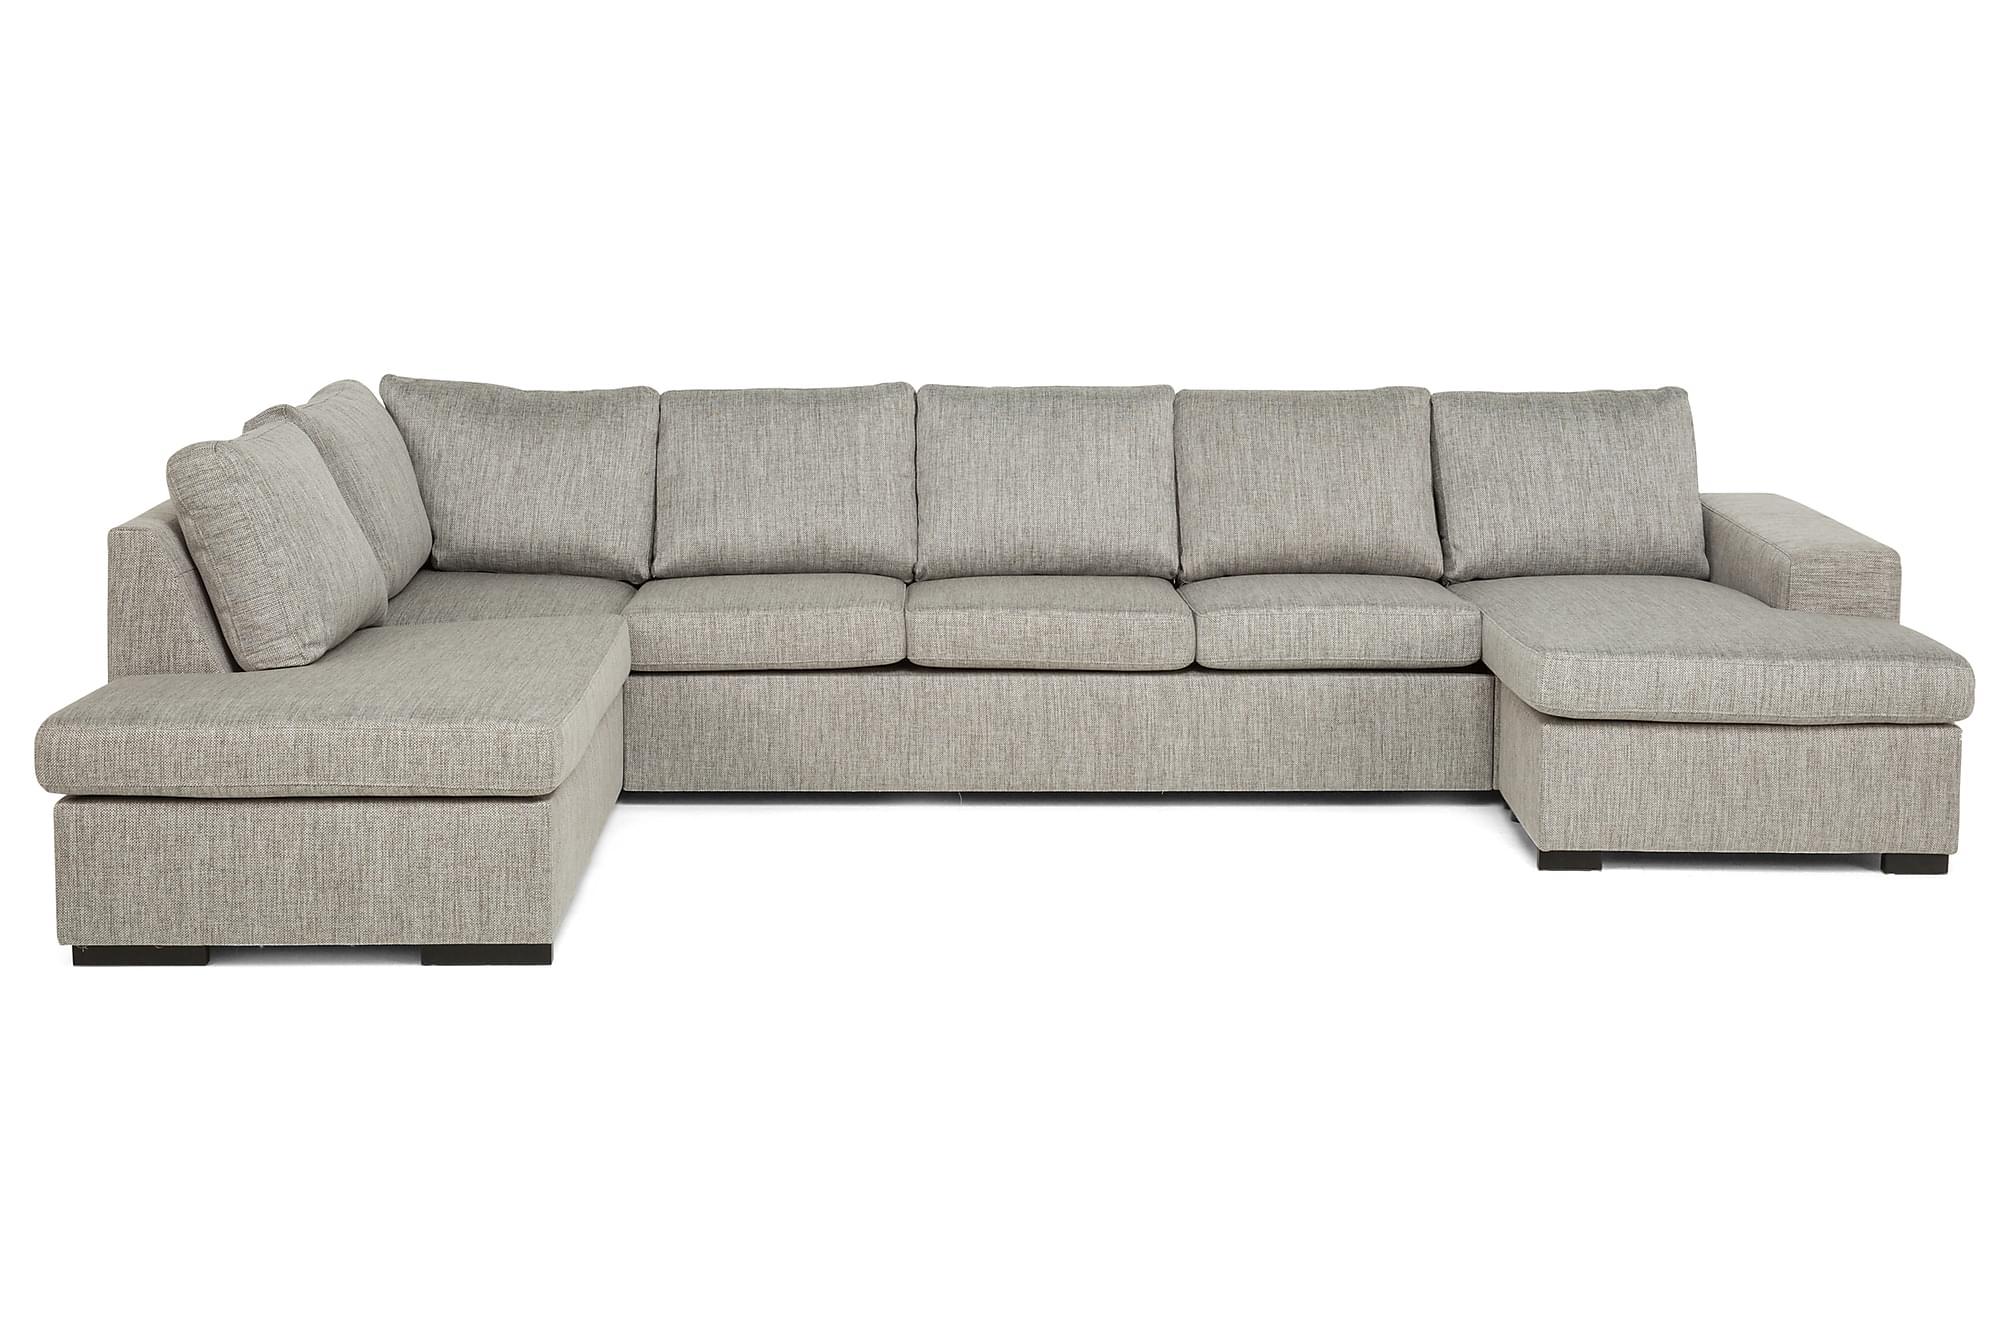 AVERY U-soffa med Divan Höger Beige, U-soffor